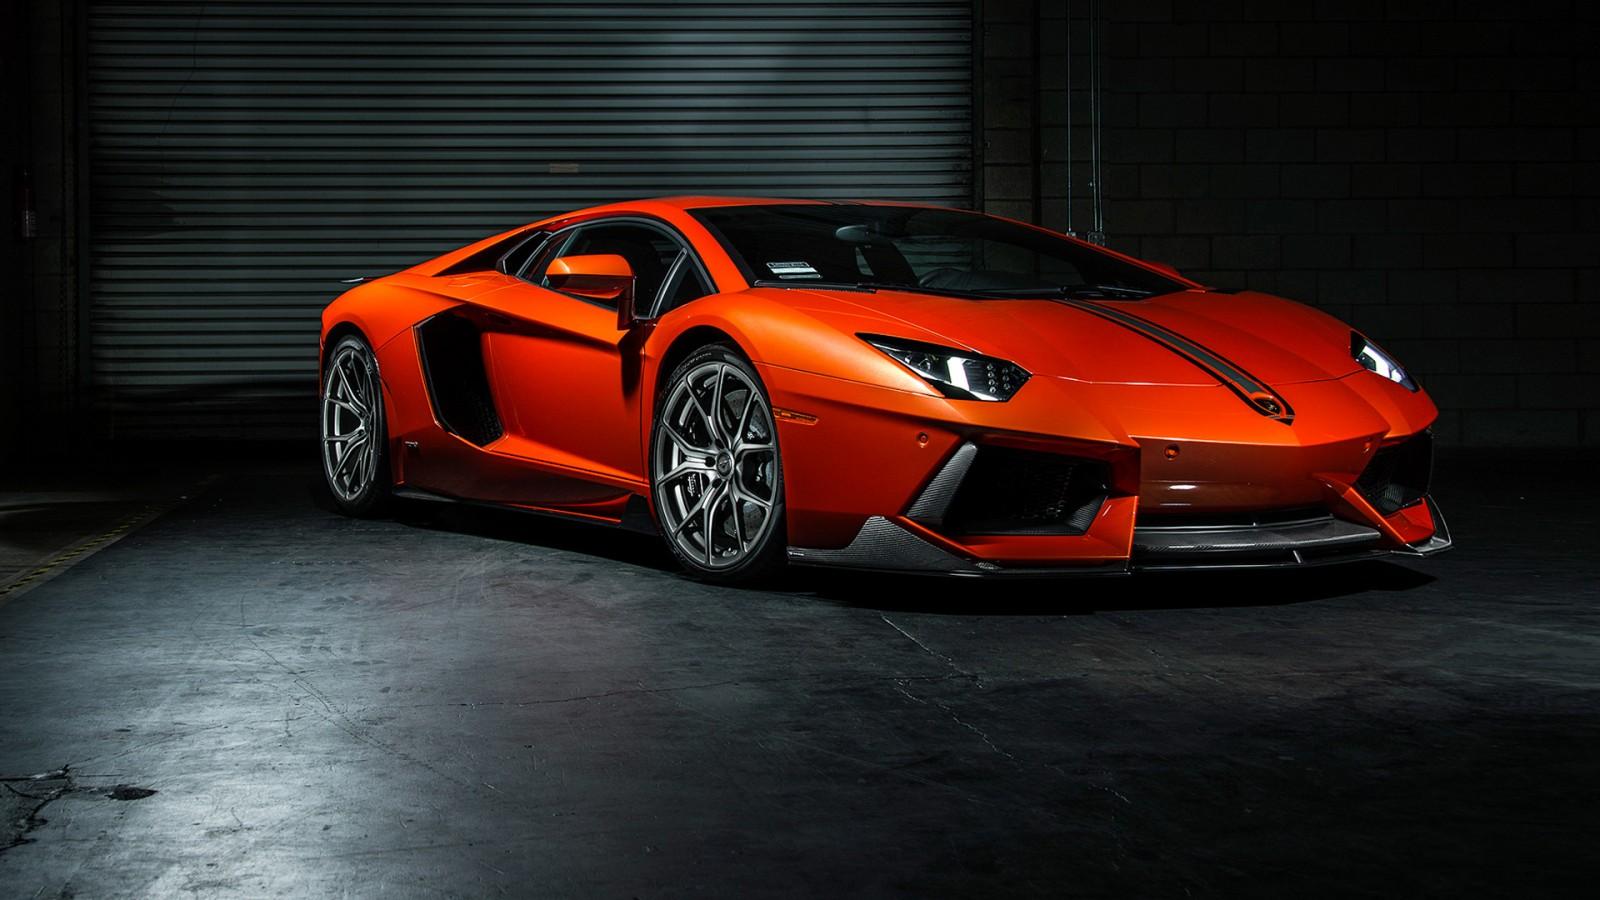 2015 Vorsteiner Lamborghini Aventador Coupe Wallpaper Hd